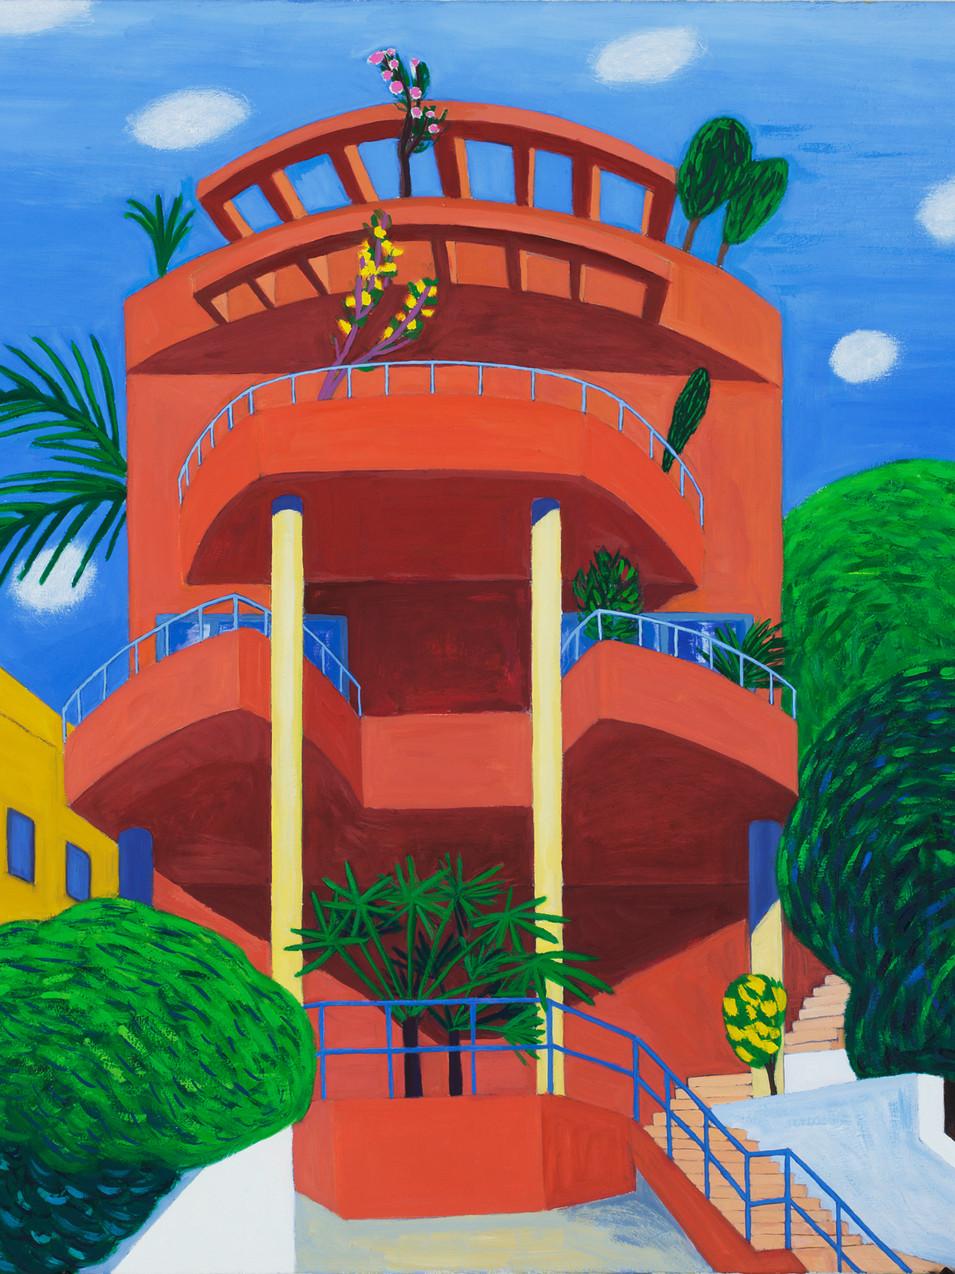 Gudrun Petersdorff | Rotes Haus | Herzliya | 2010 | Öl auf Leinwand | 110 x 100 cm | Foto Christoph Sandig | 4800 Euro